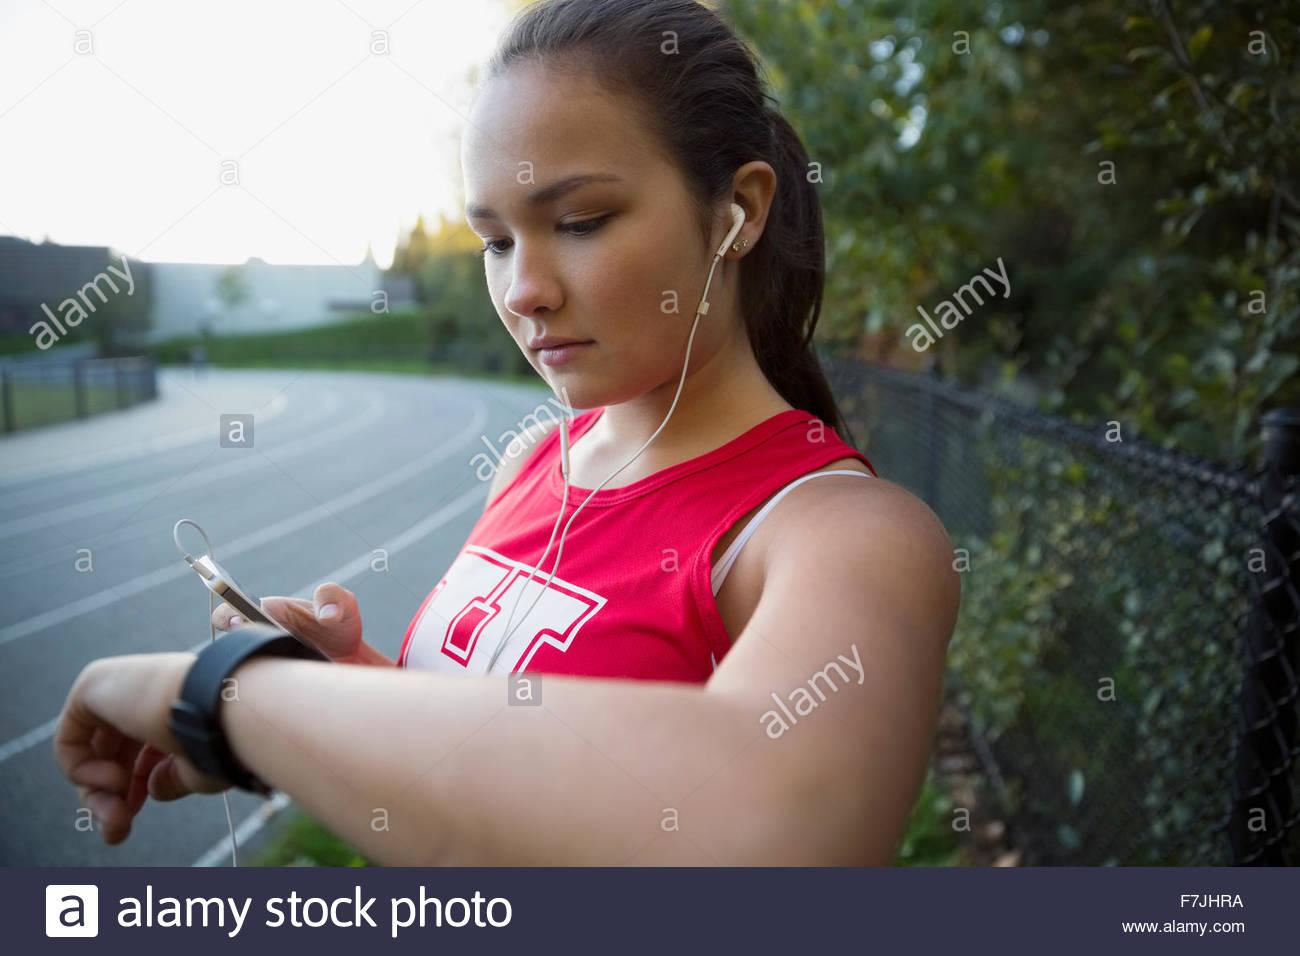 High school atleta escuchando música control reloj de pulsera Imagen De Stock